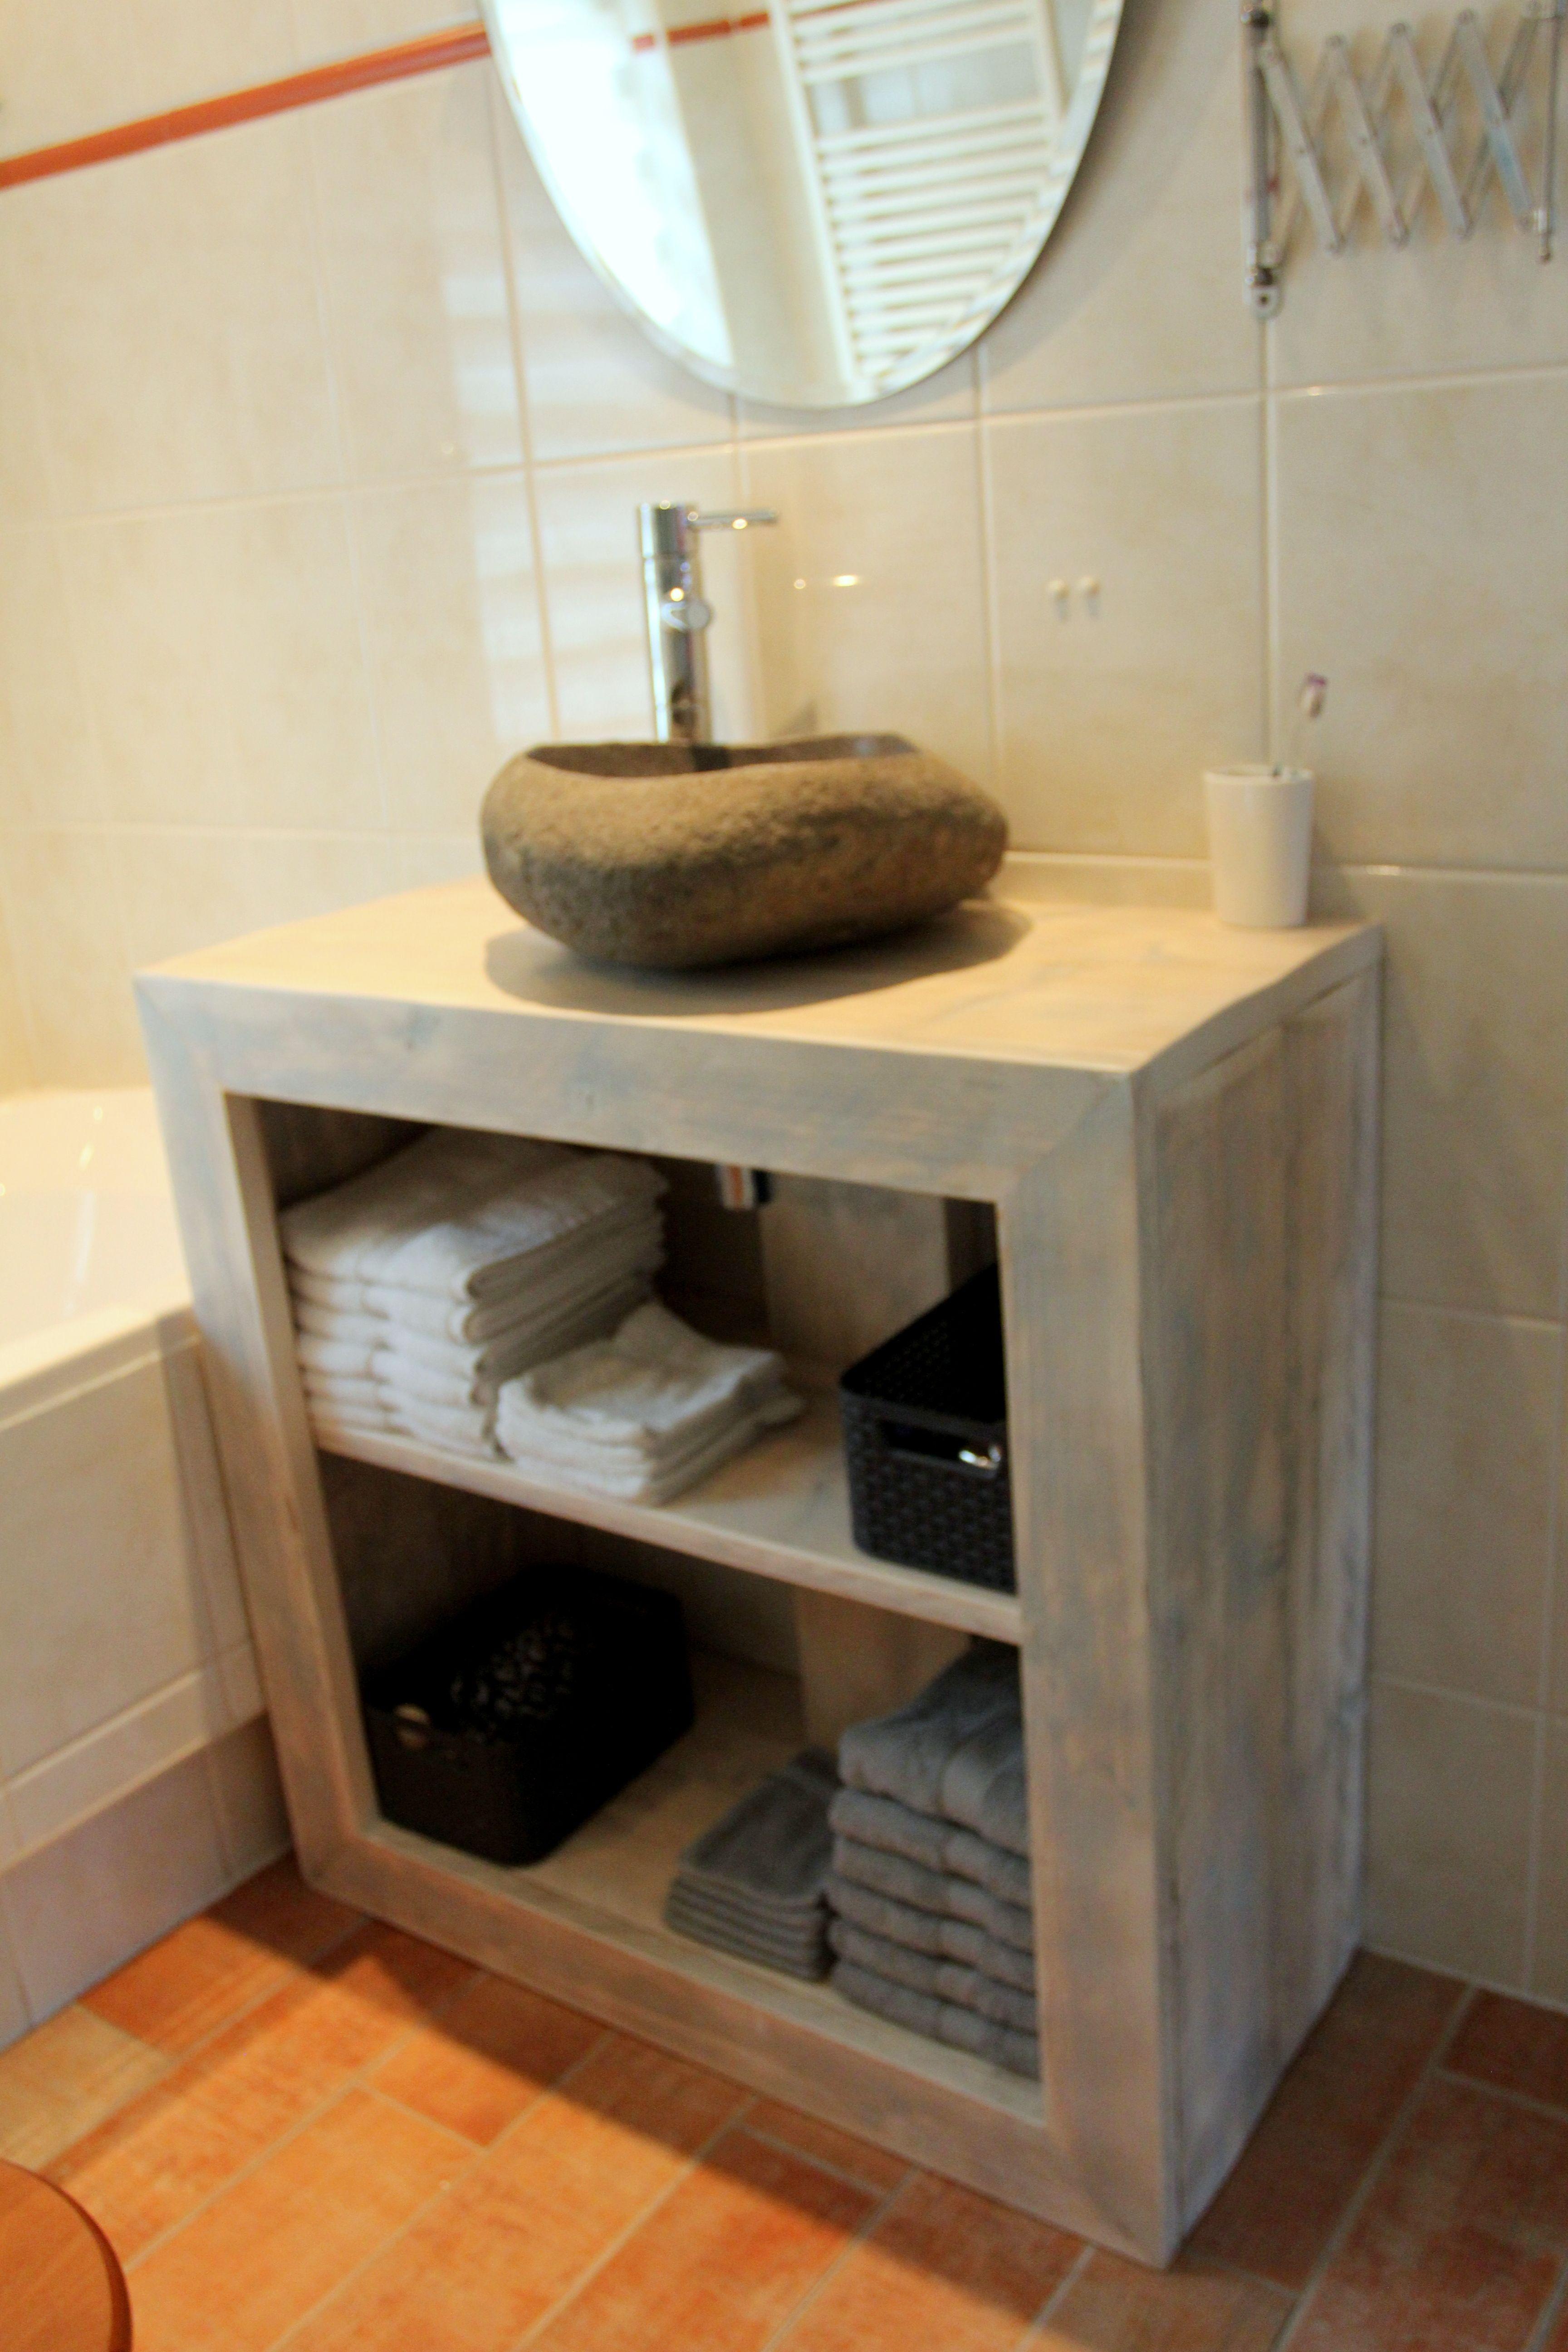 badkamermeubel van steigerhout met kiezel wasbak gemaakt en foto